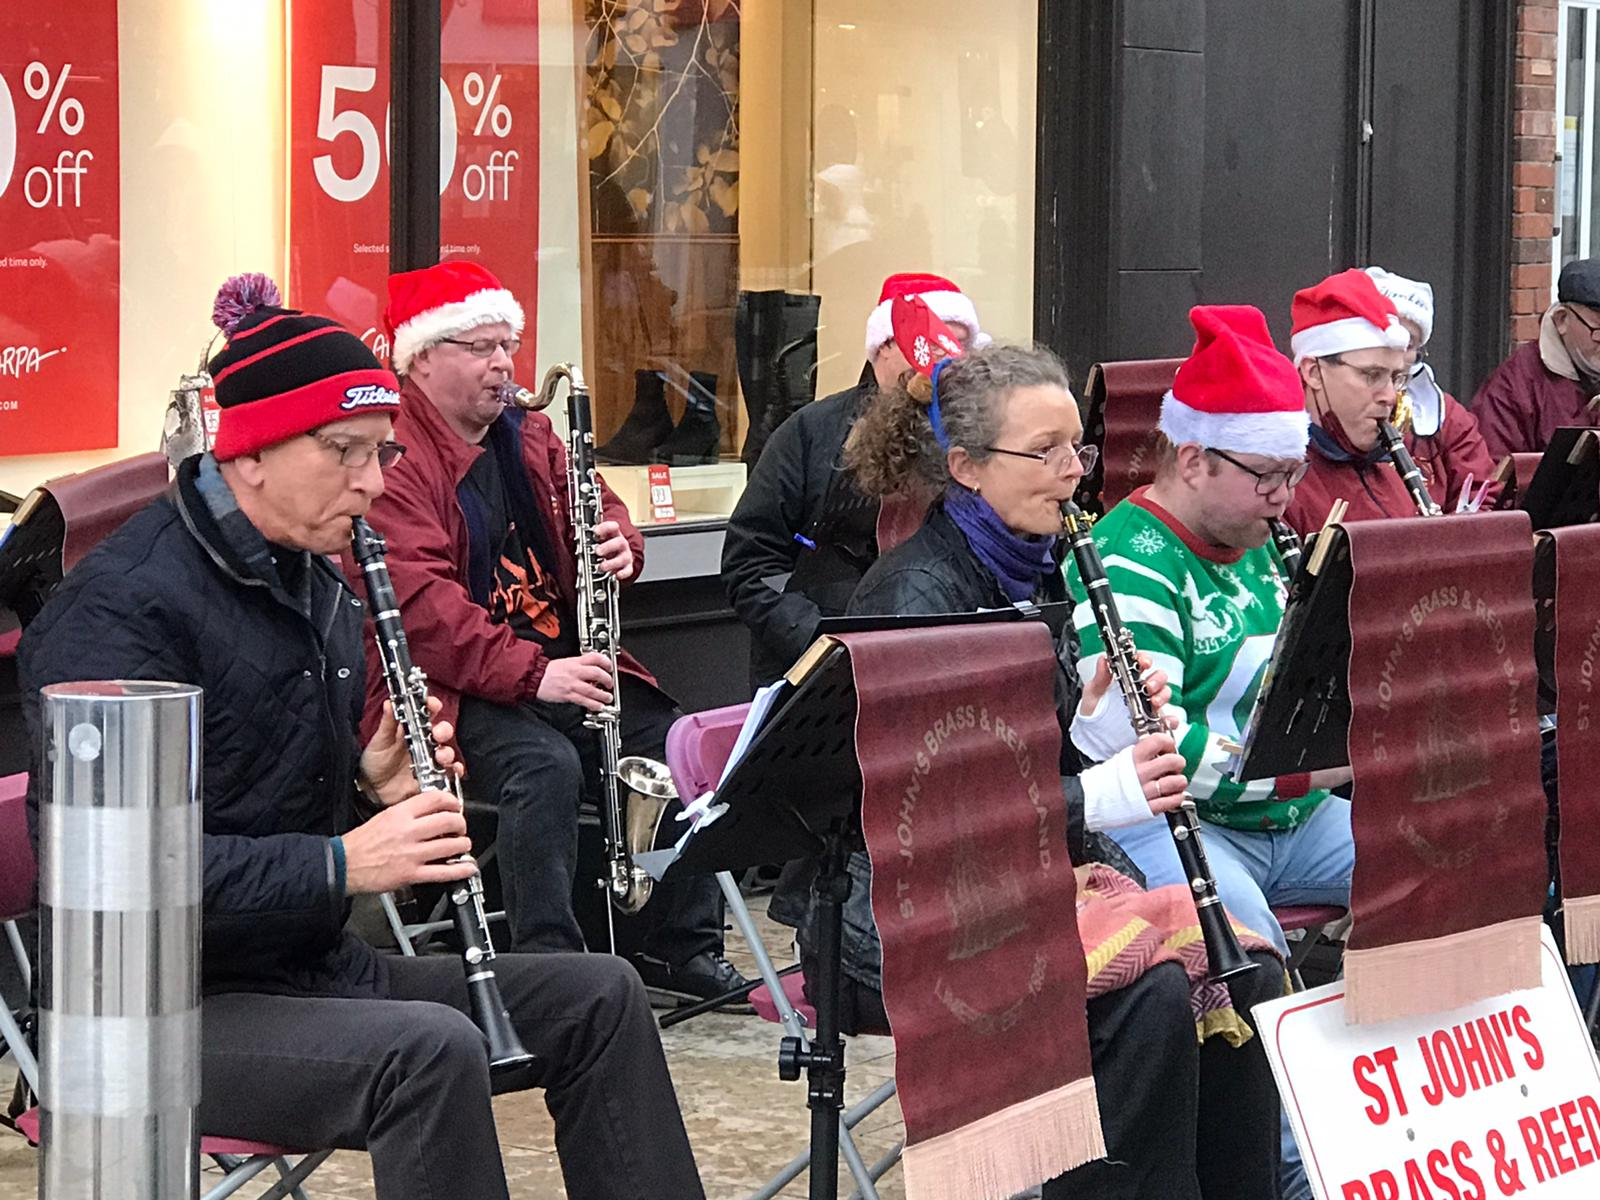 St. John's Brass & Reed Band